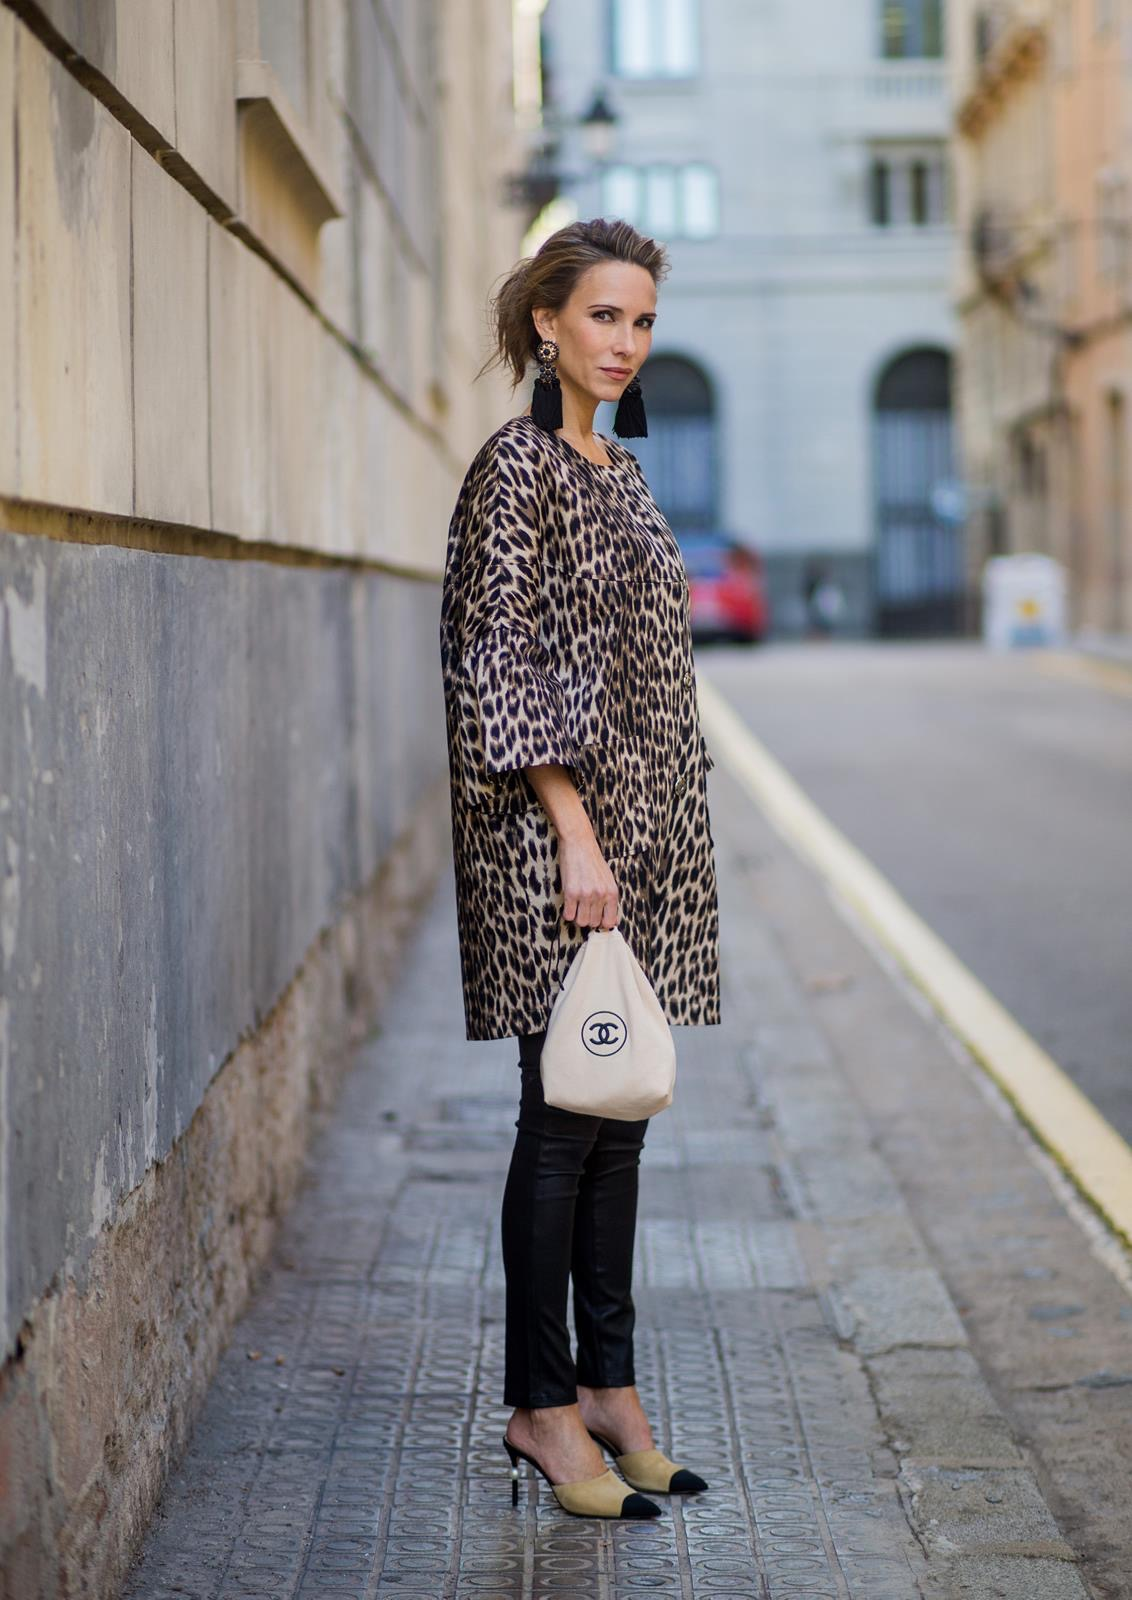 b3d045be Lapp Take A Alexandra Walk Wild Side On Blog The 7r7U0q8